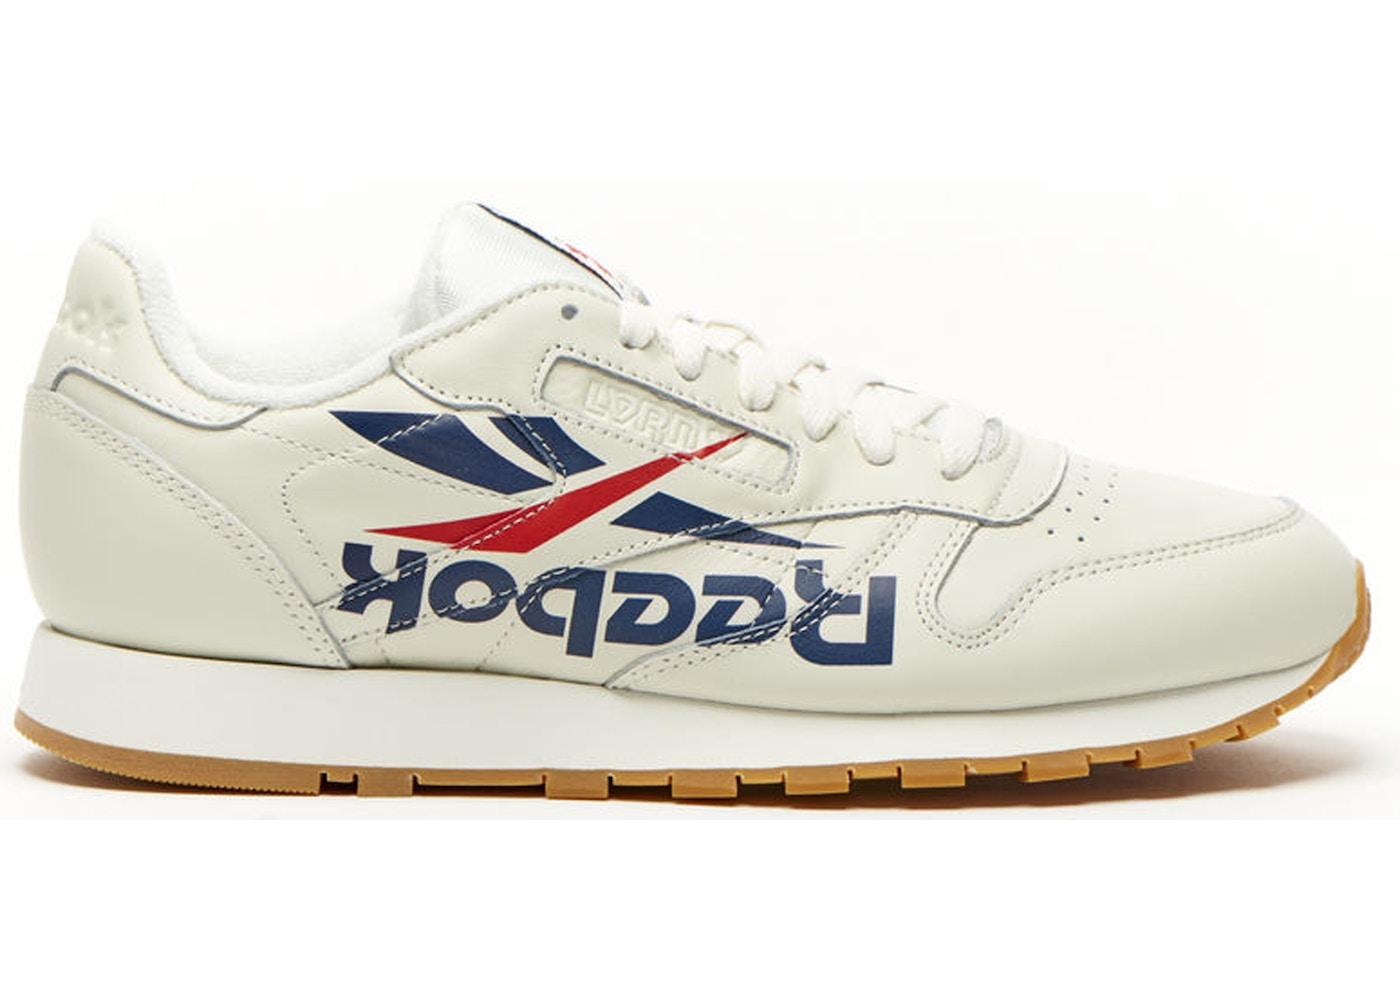 3ed5fca9493 Women s Reebok Classics Shoes - Reebok WORKOUT PLUS 3AM - White   Black Reebok  Classics Womens